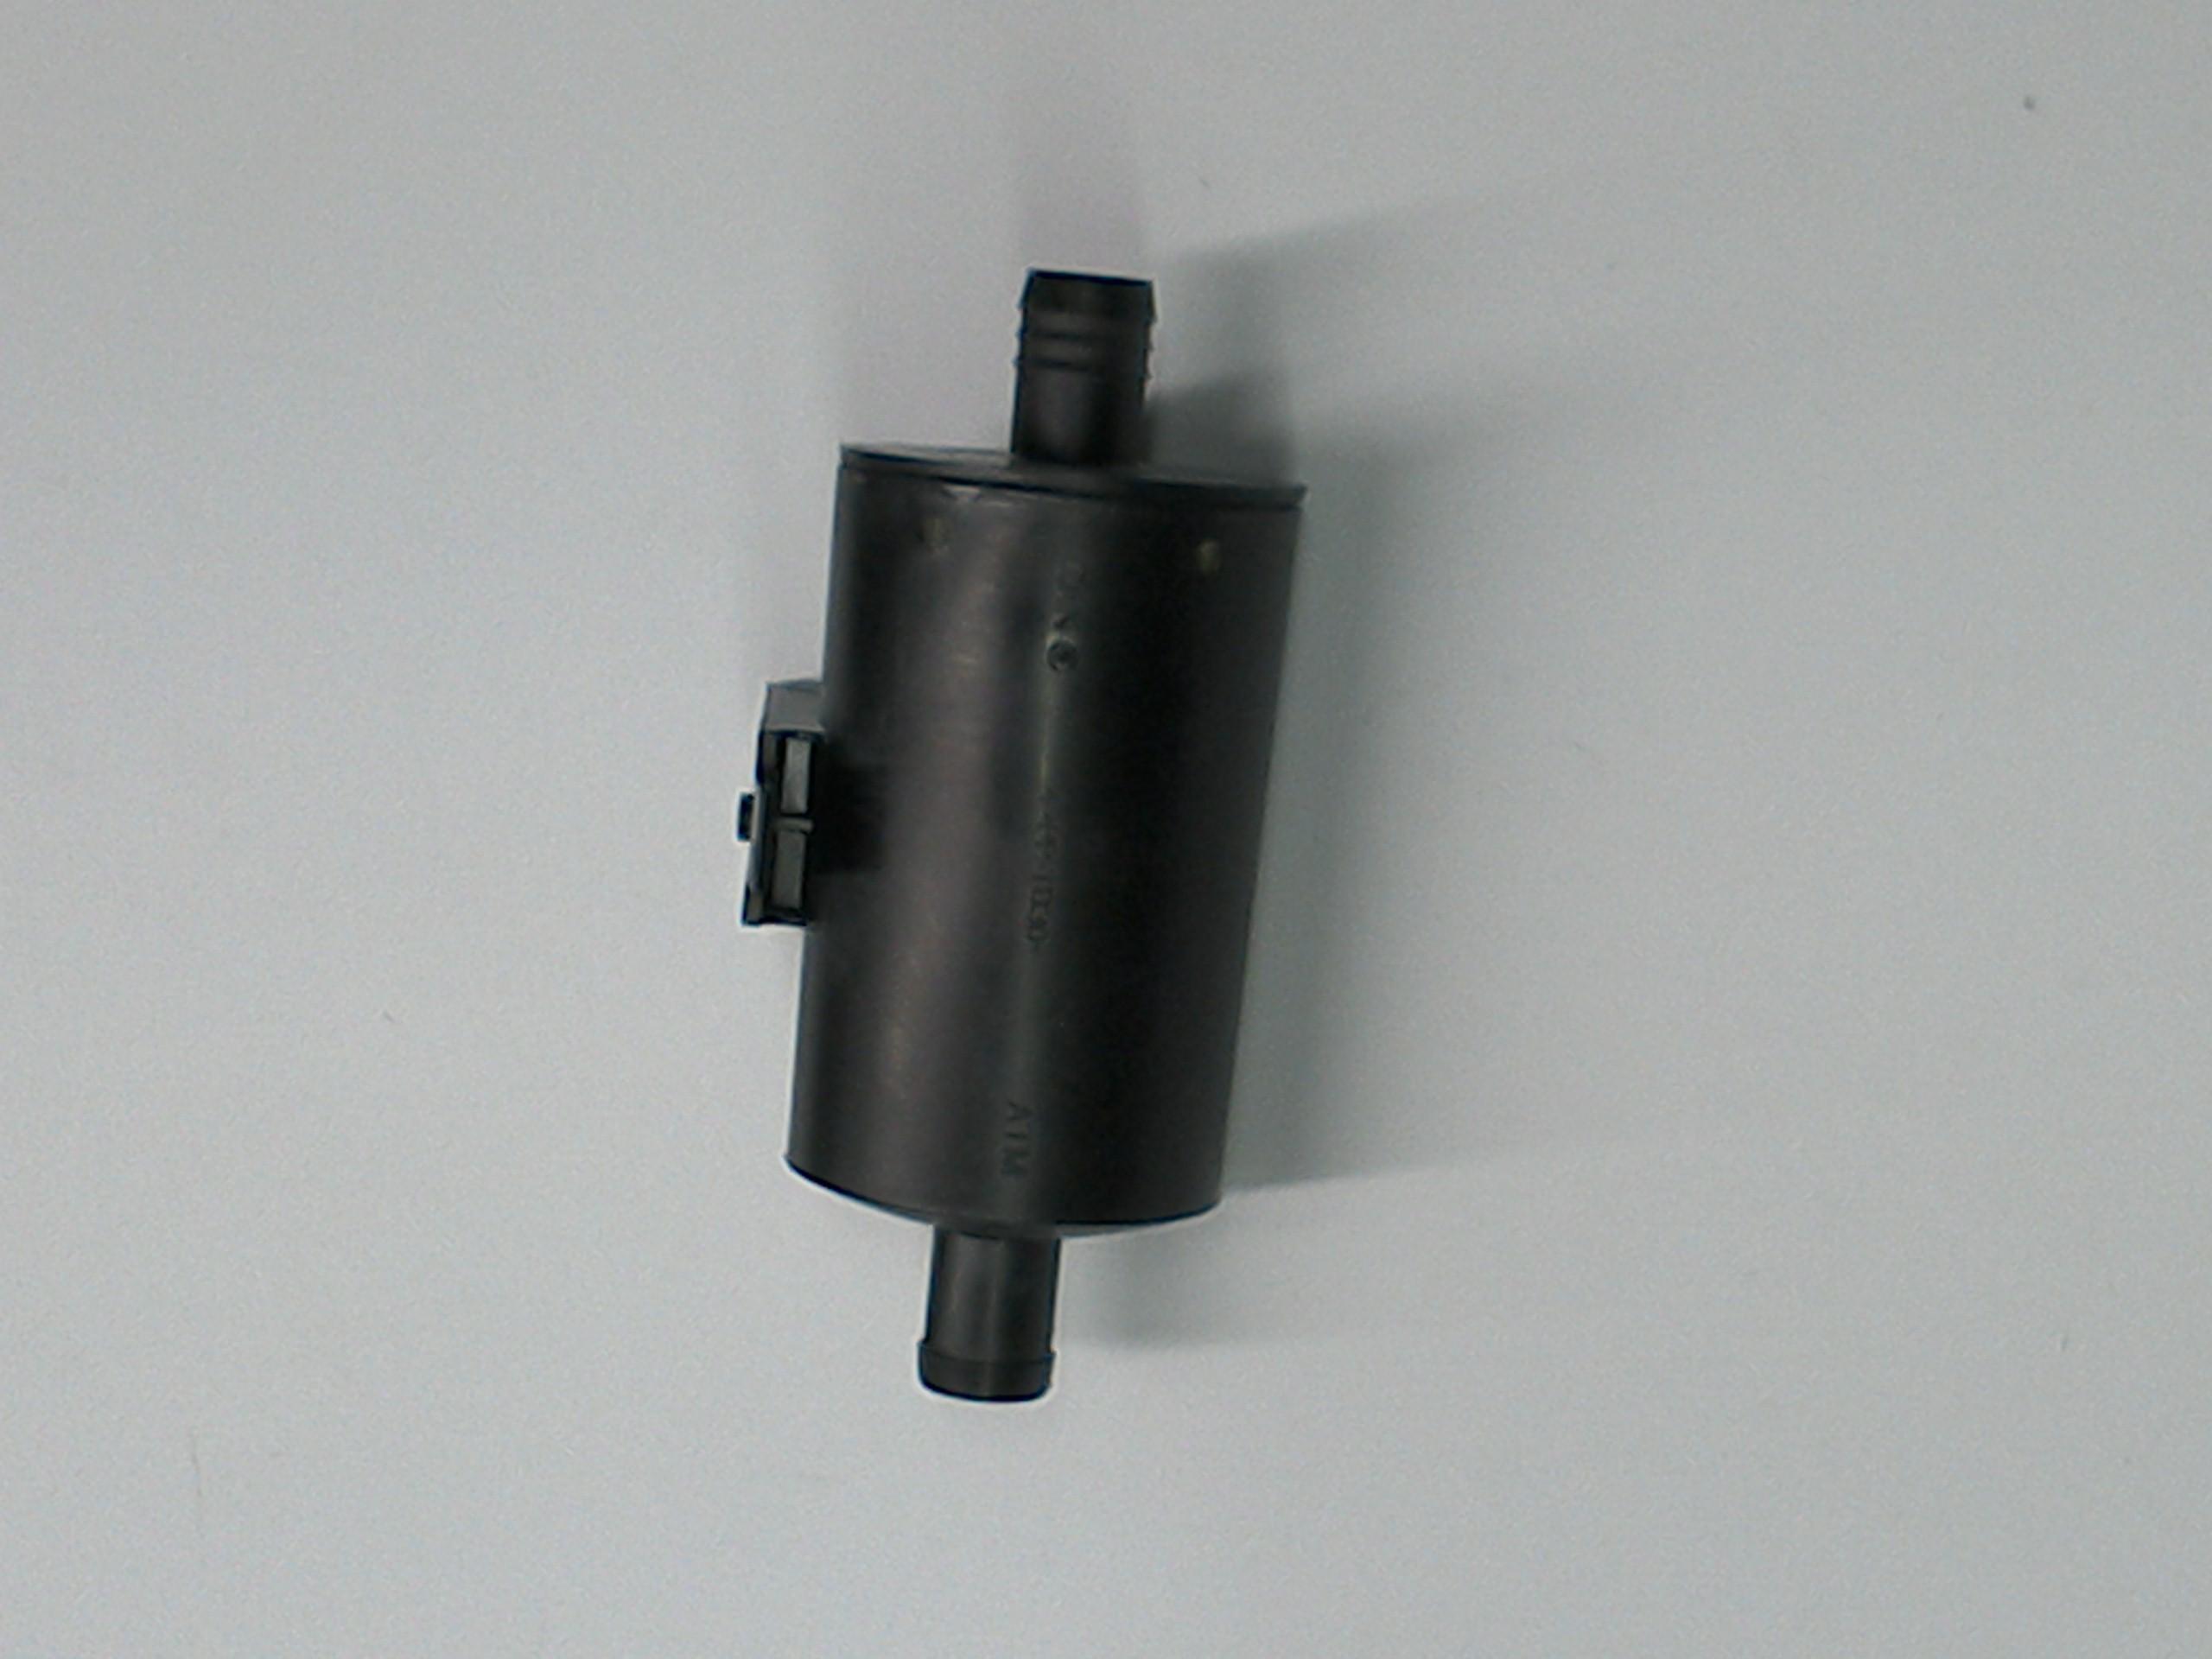 04891994aa dodge filter fuel vapor vent canister  pump 1997 corvette wiring diagram 1997 corvette wiring diagram 1997 corvette wiring diagram 1997 corvette wiring diagram